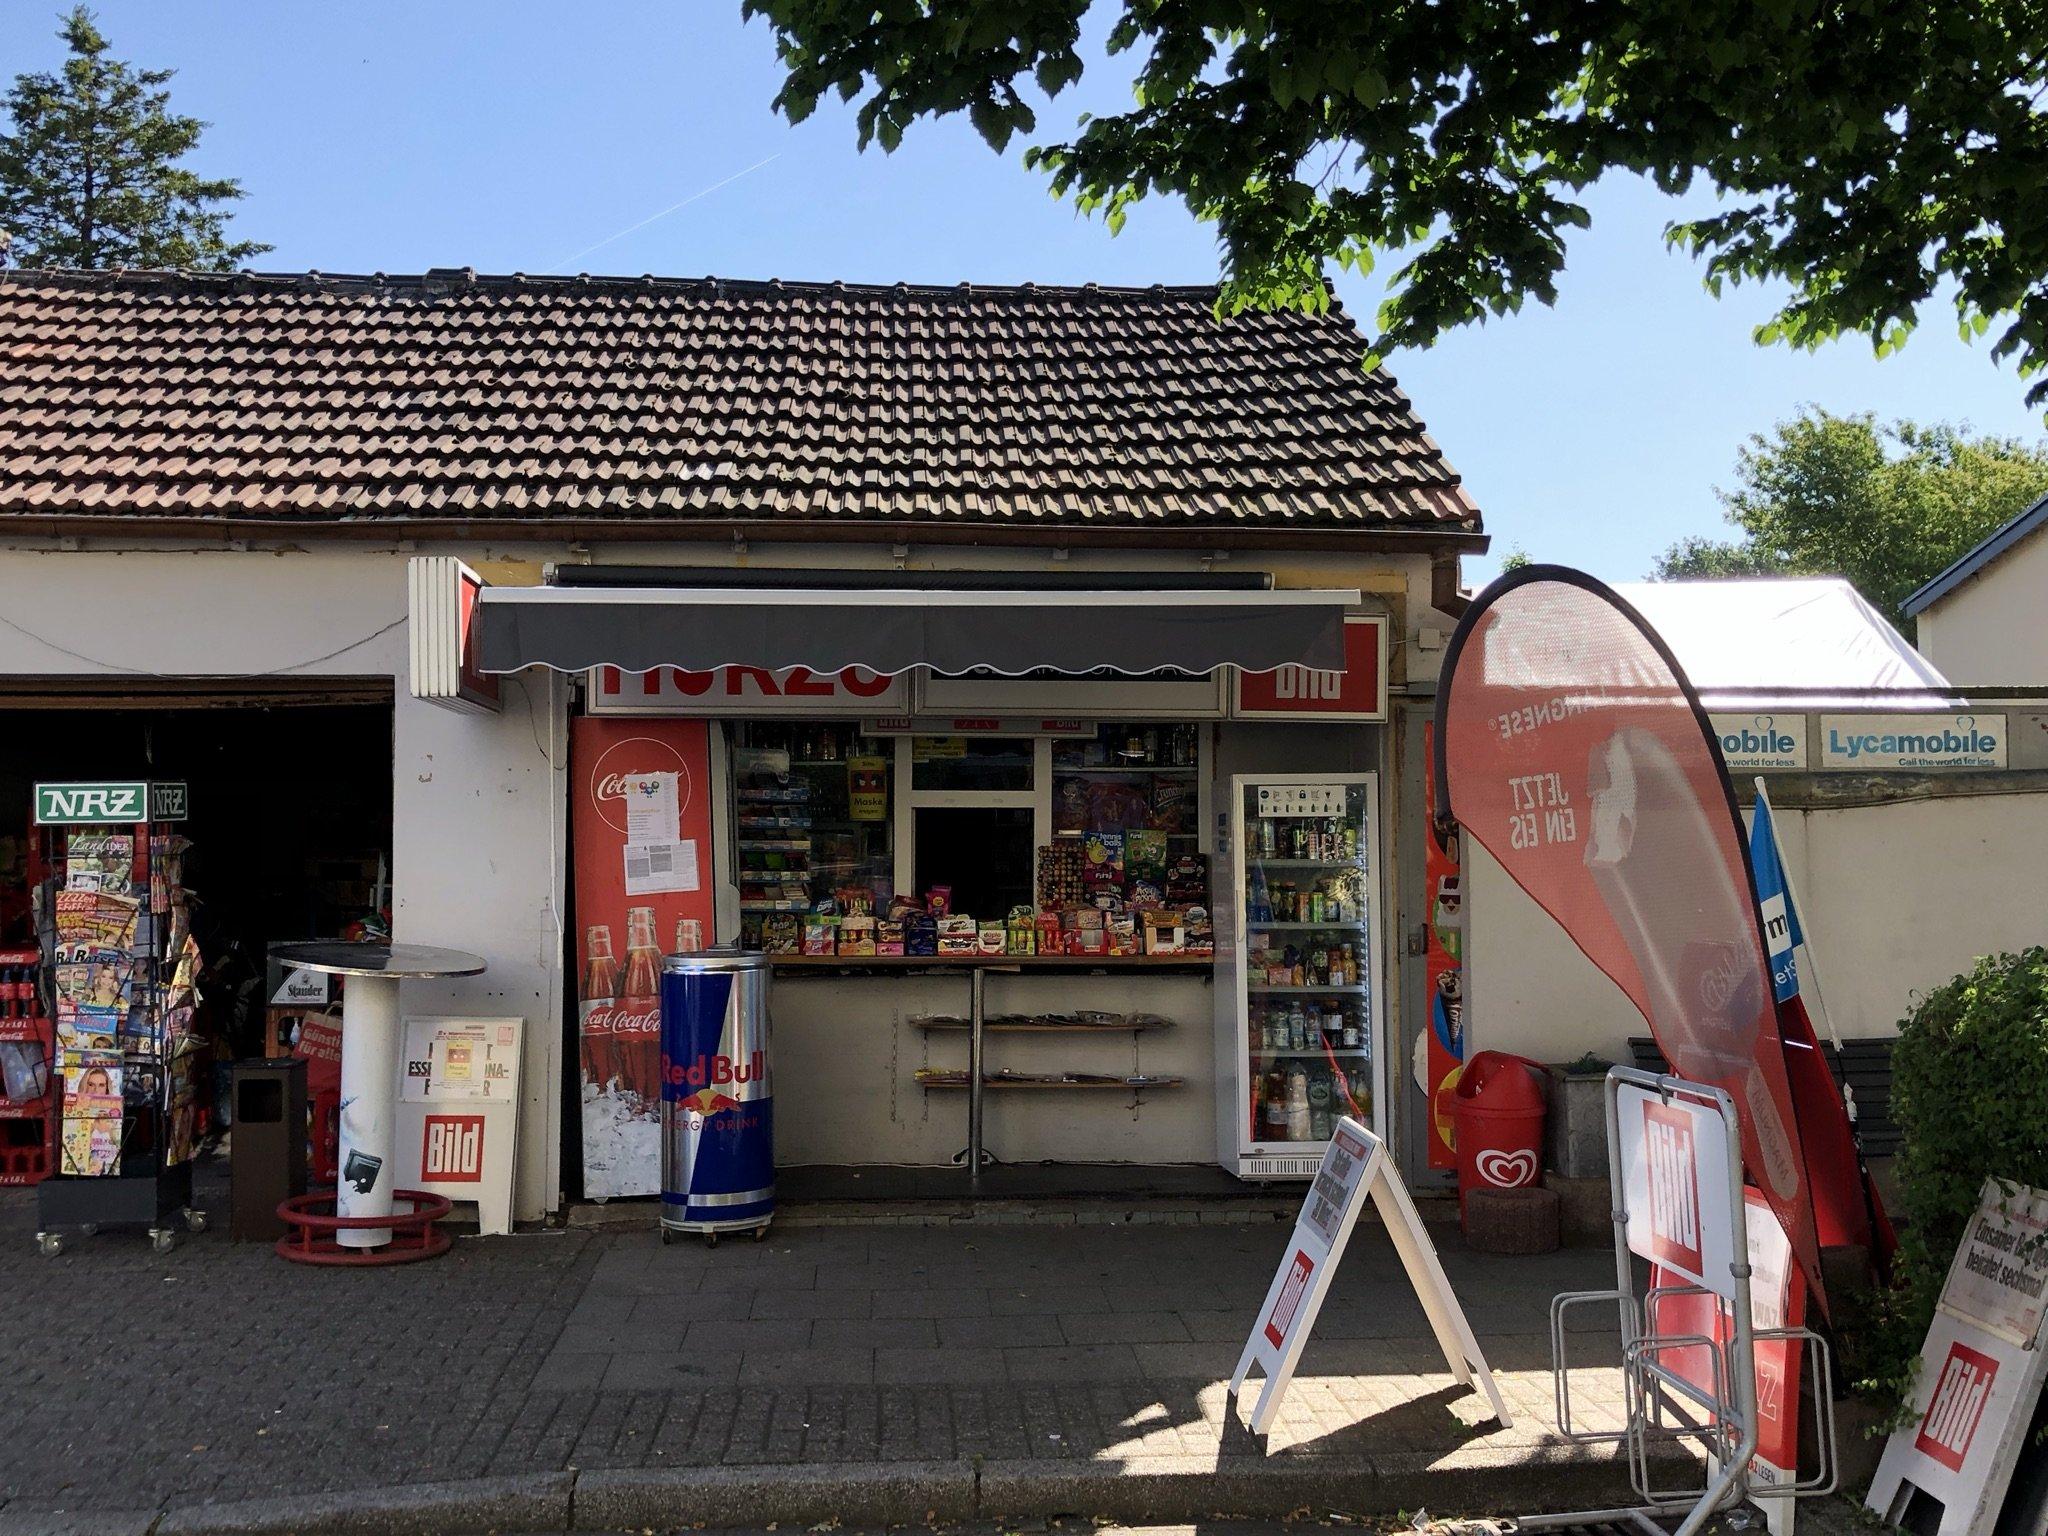 Jimmys Kiosk in Essen